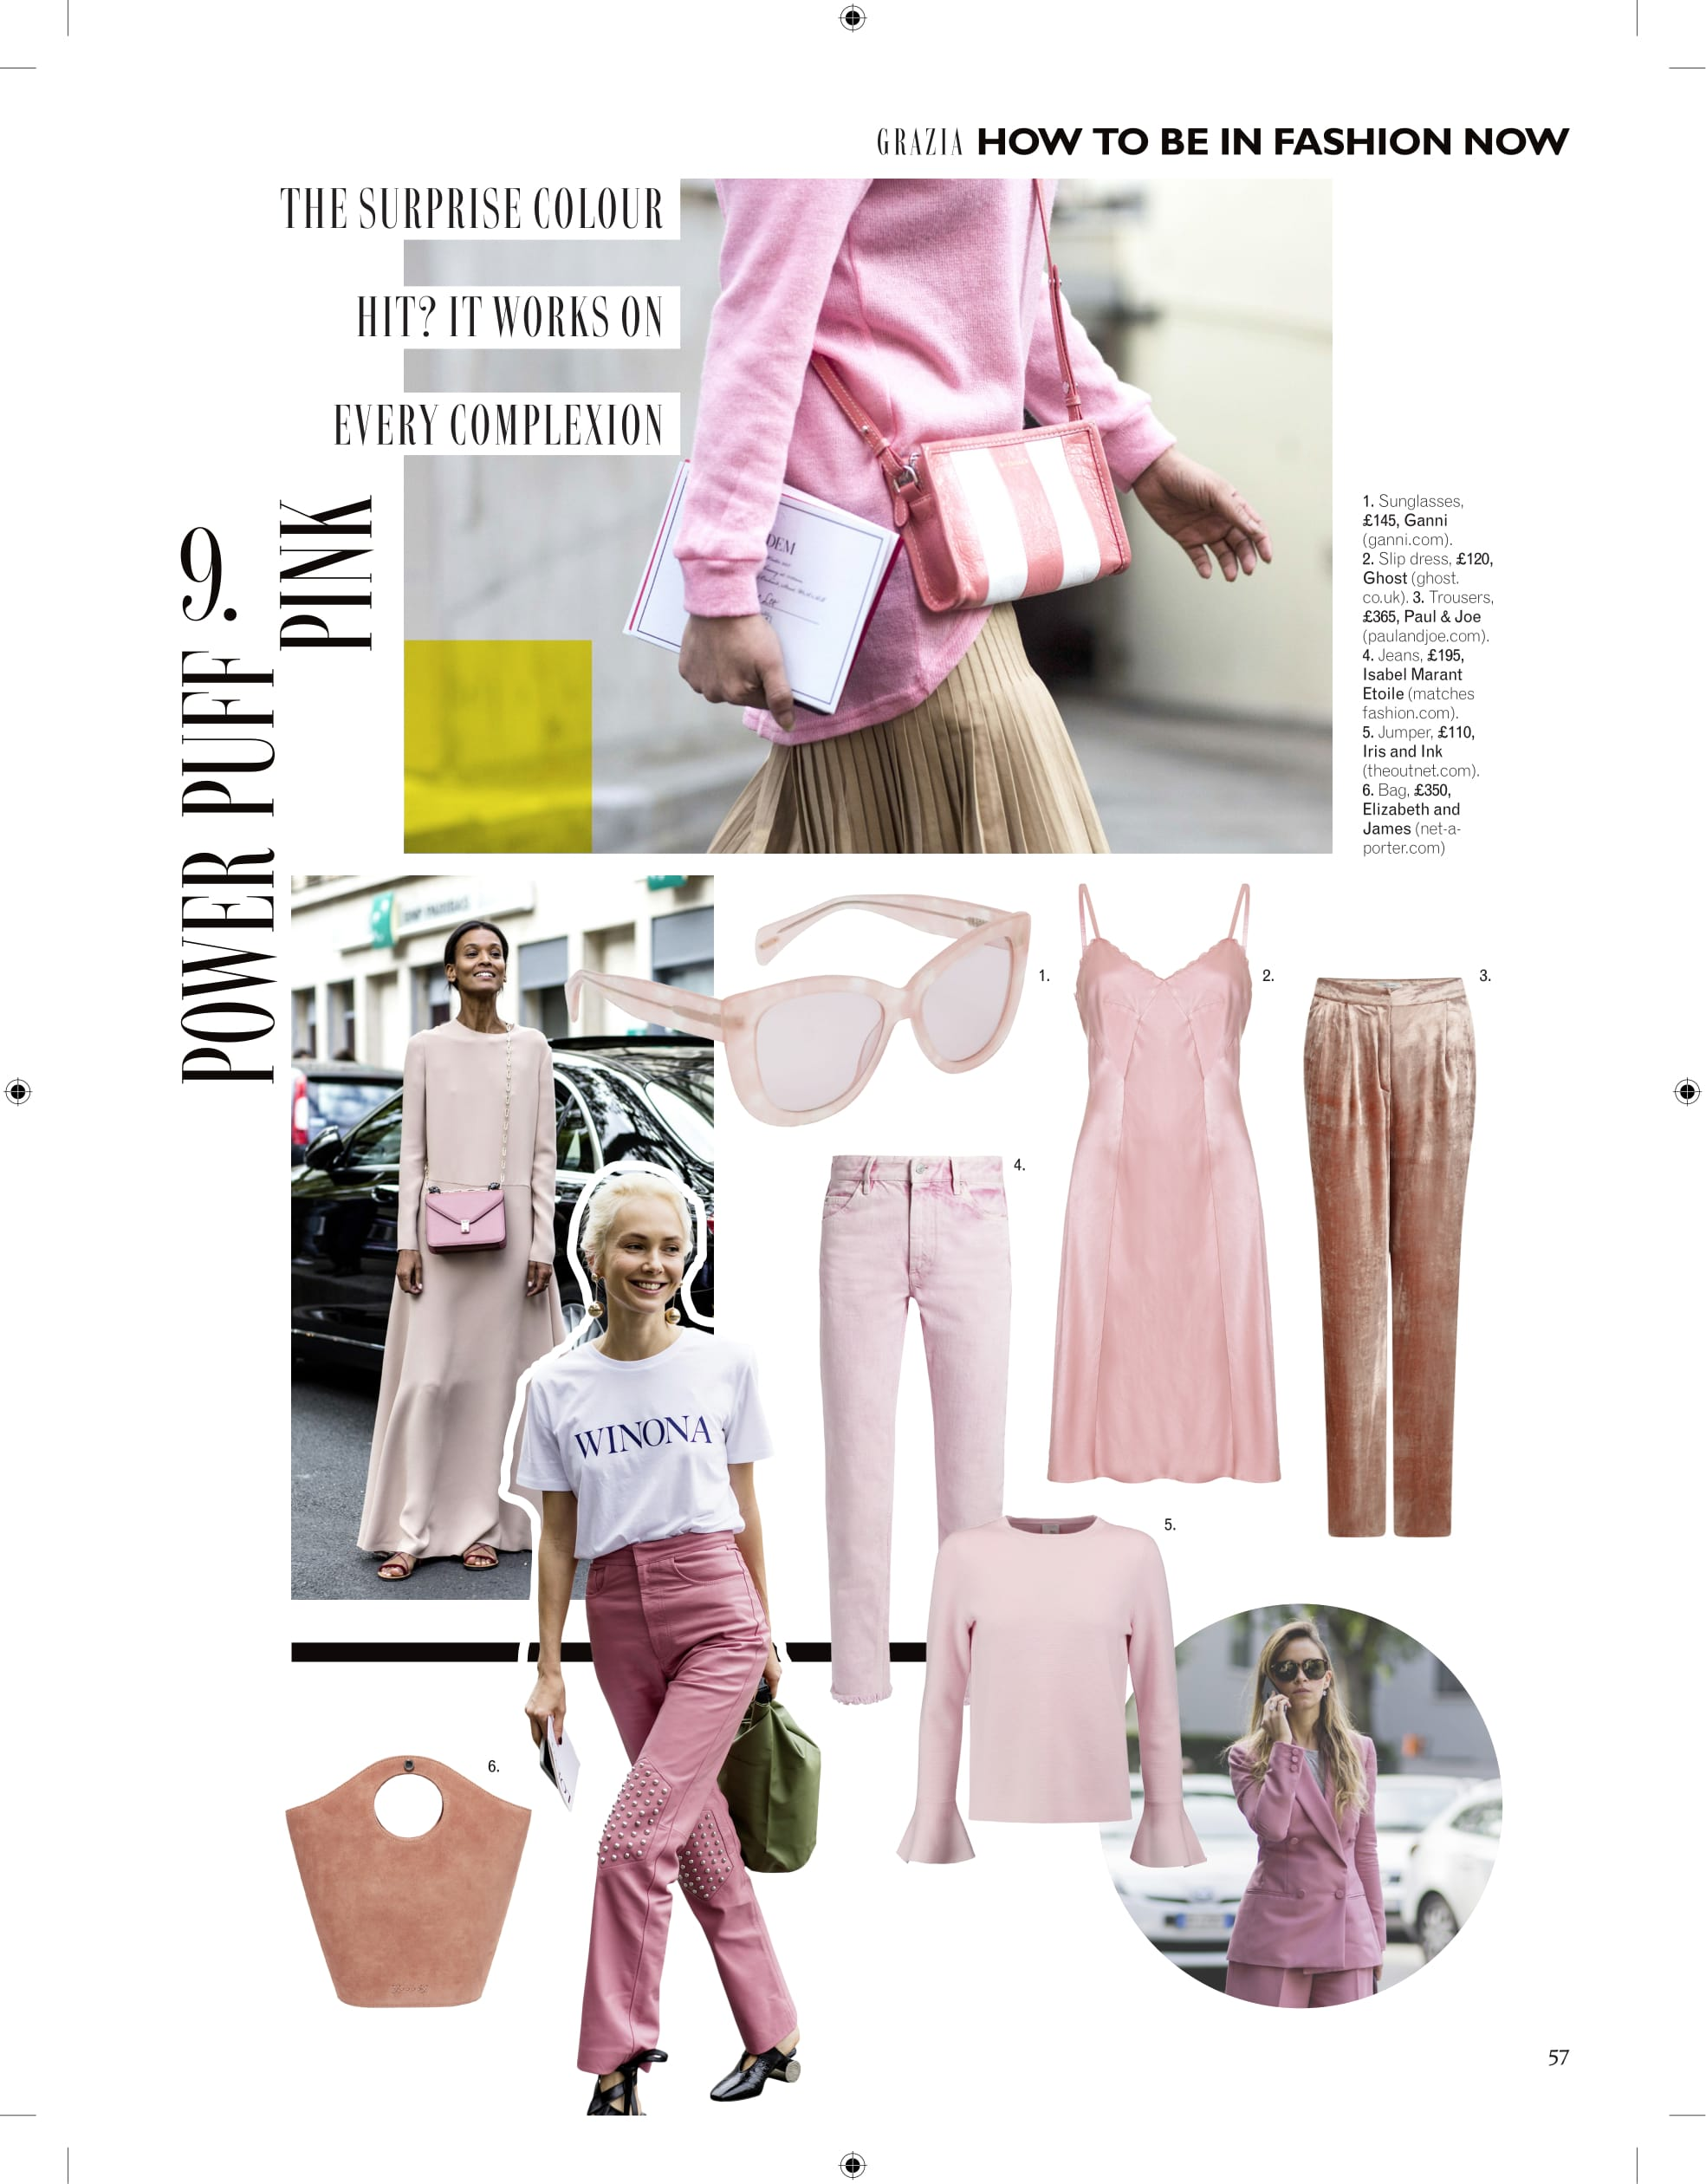 Fashion_STREET STYLE SPESH 6pp_pdf_6-1.jpg